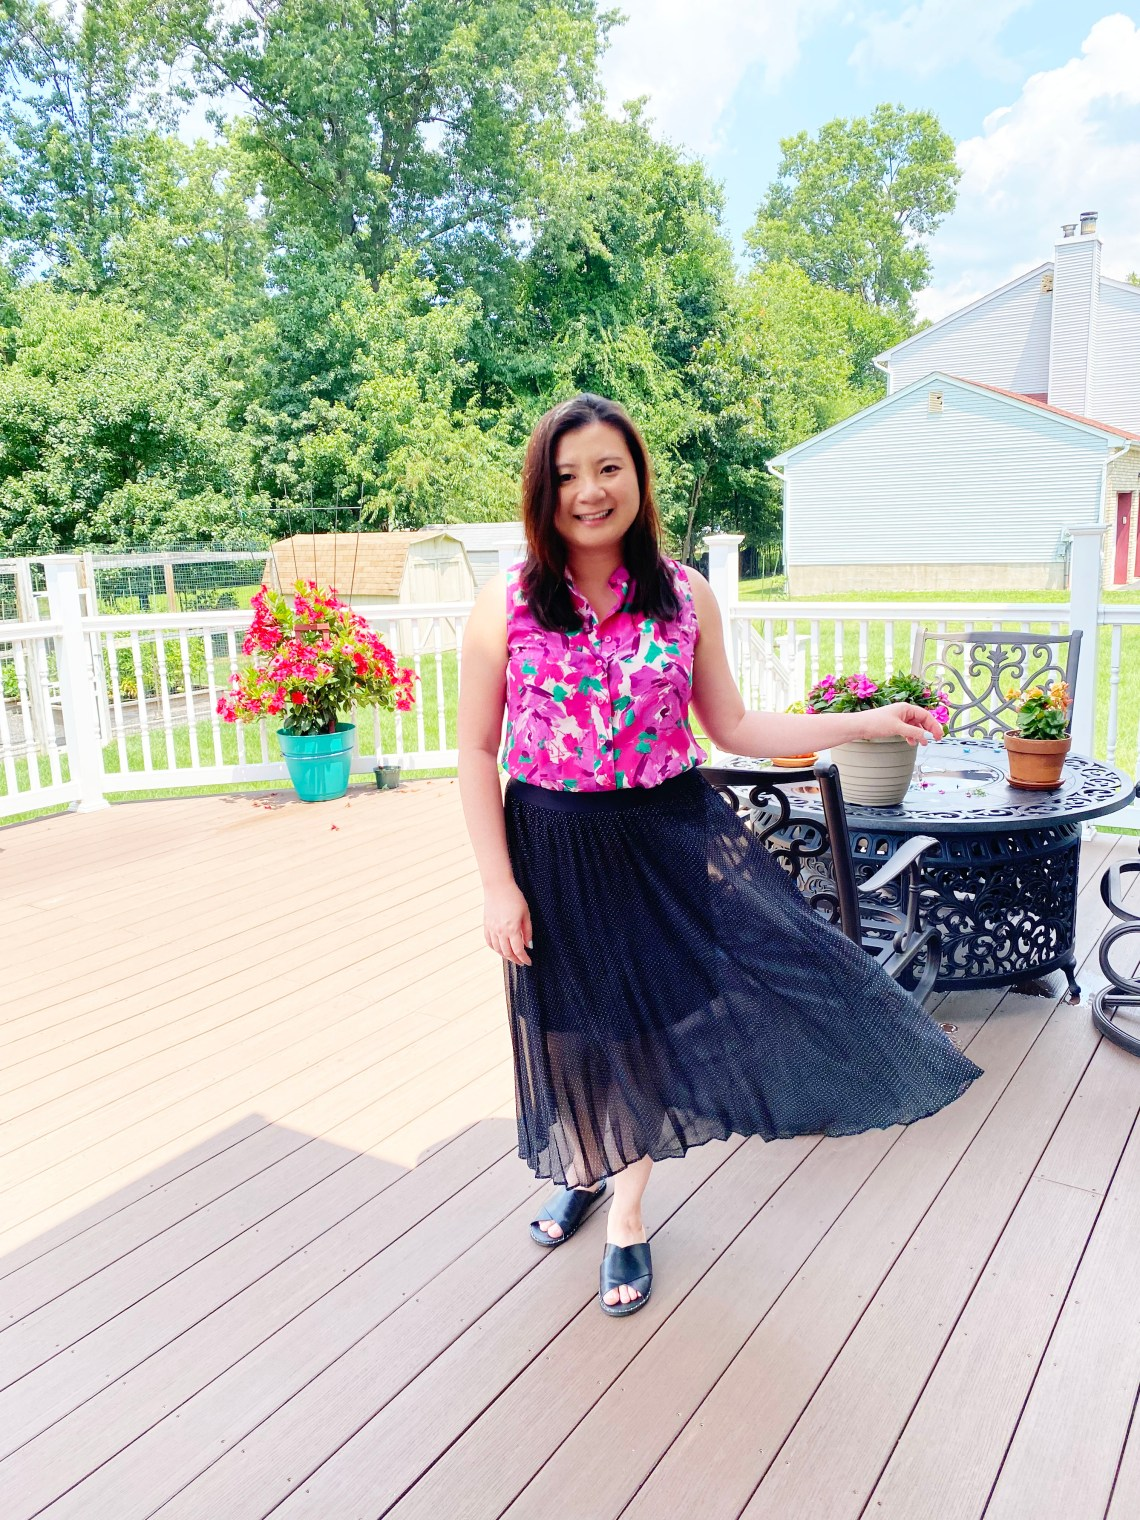 Floral-Top-Polka-Dot-Skirt